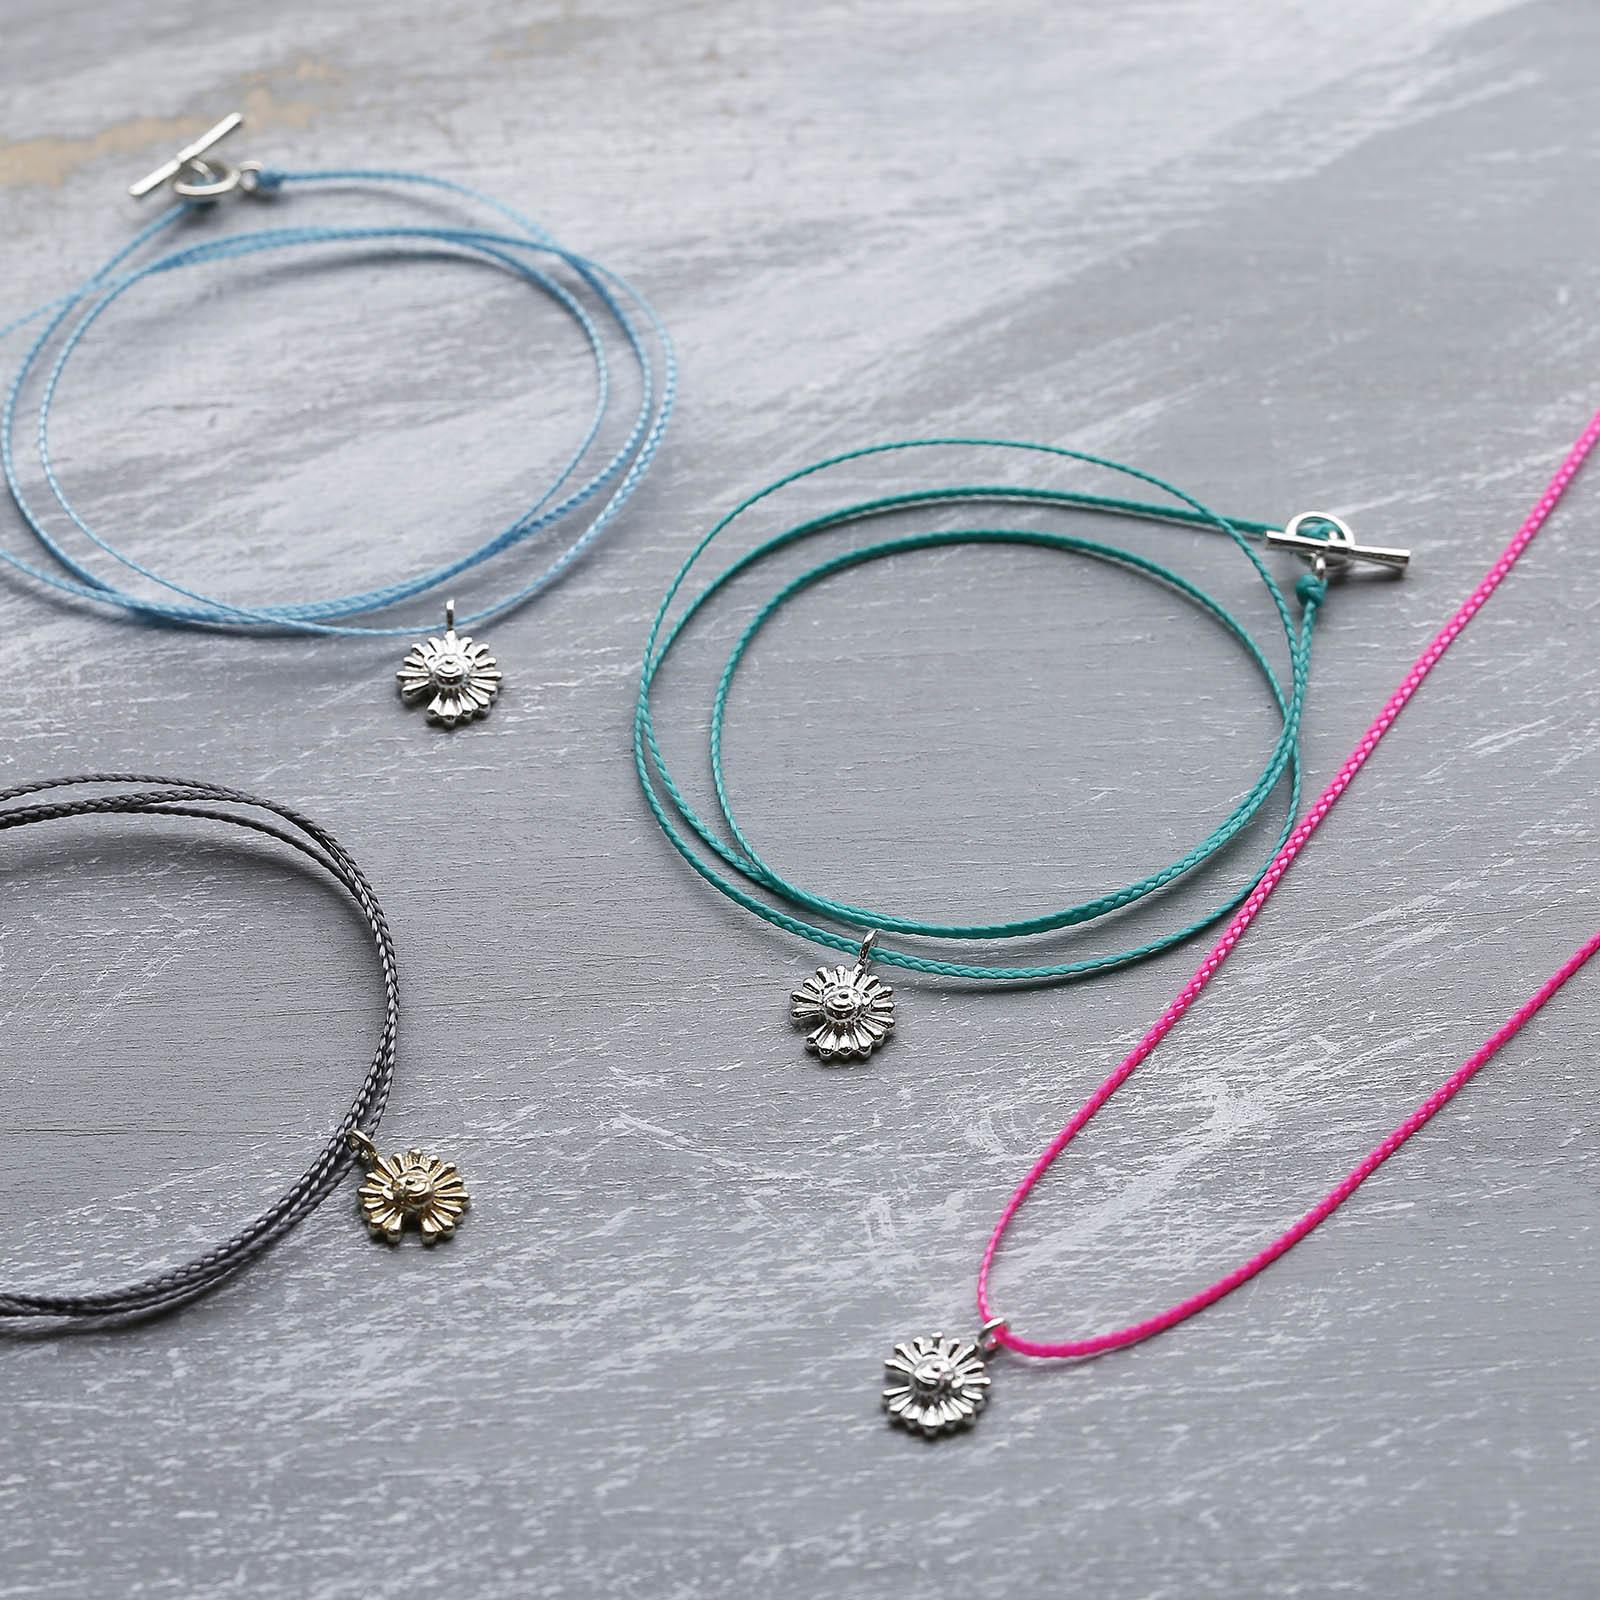 One Mile Jewelry Cord Necklace&Bracelet - SUNNYDDY -